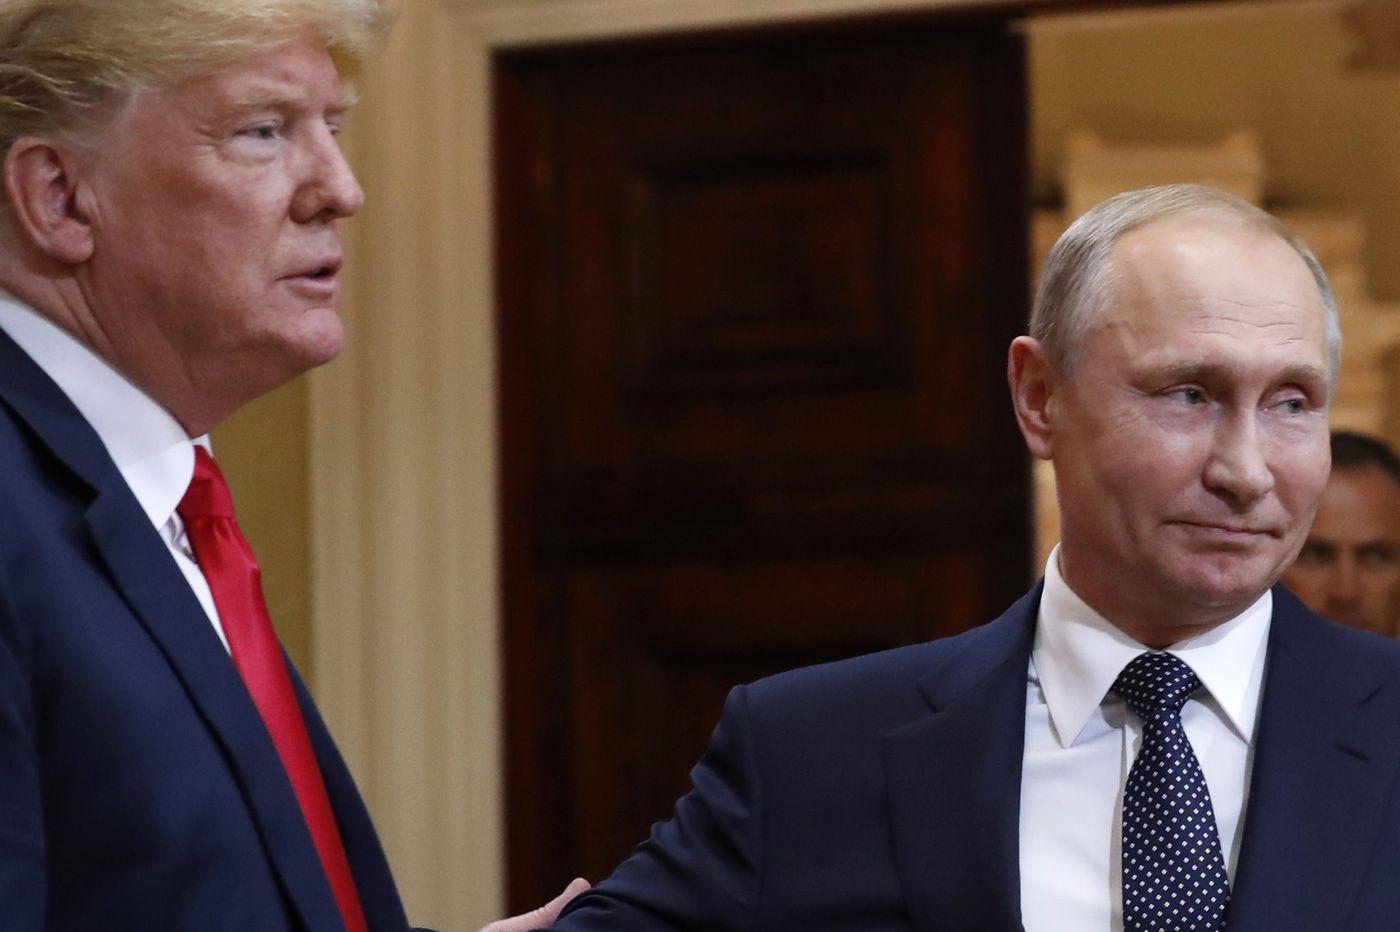 Congress should censure Trump over Russia | Editorial